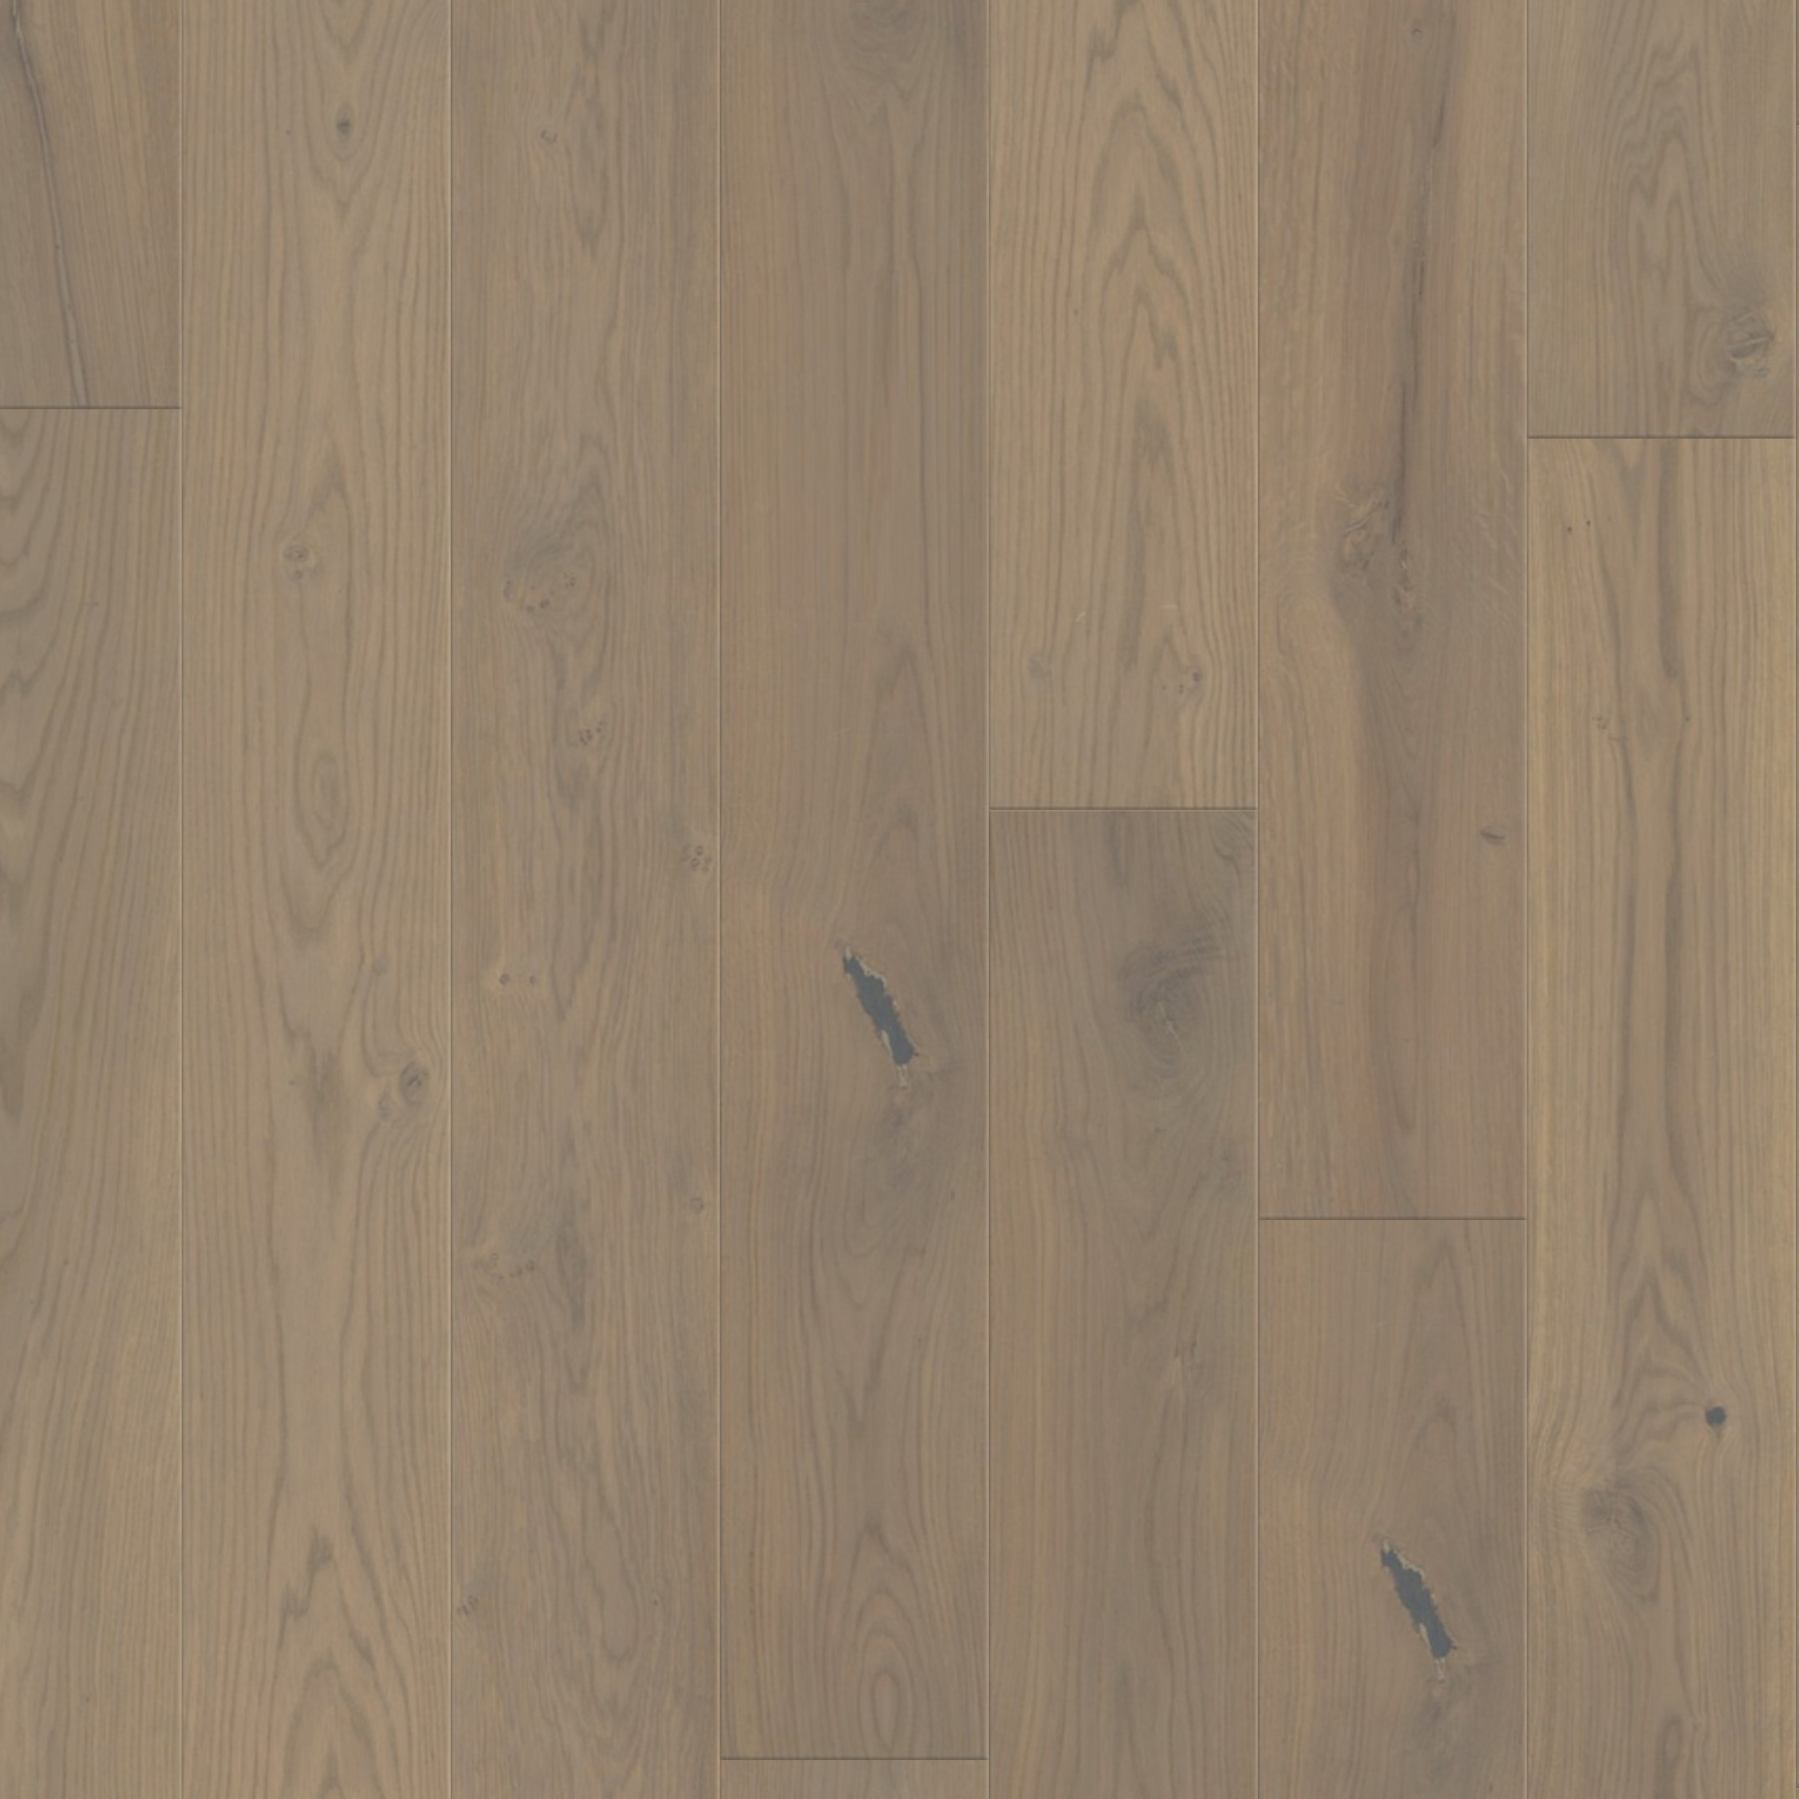 Platinum Grey: Brushed & Oiled (2881)